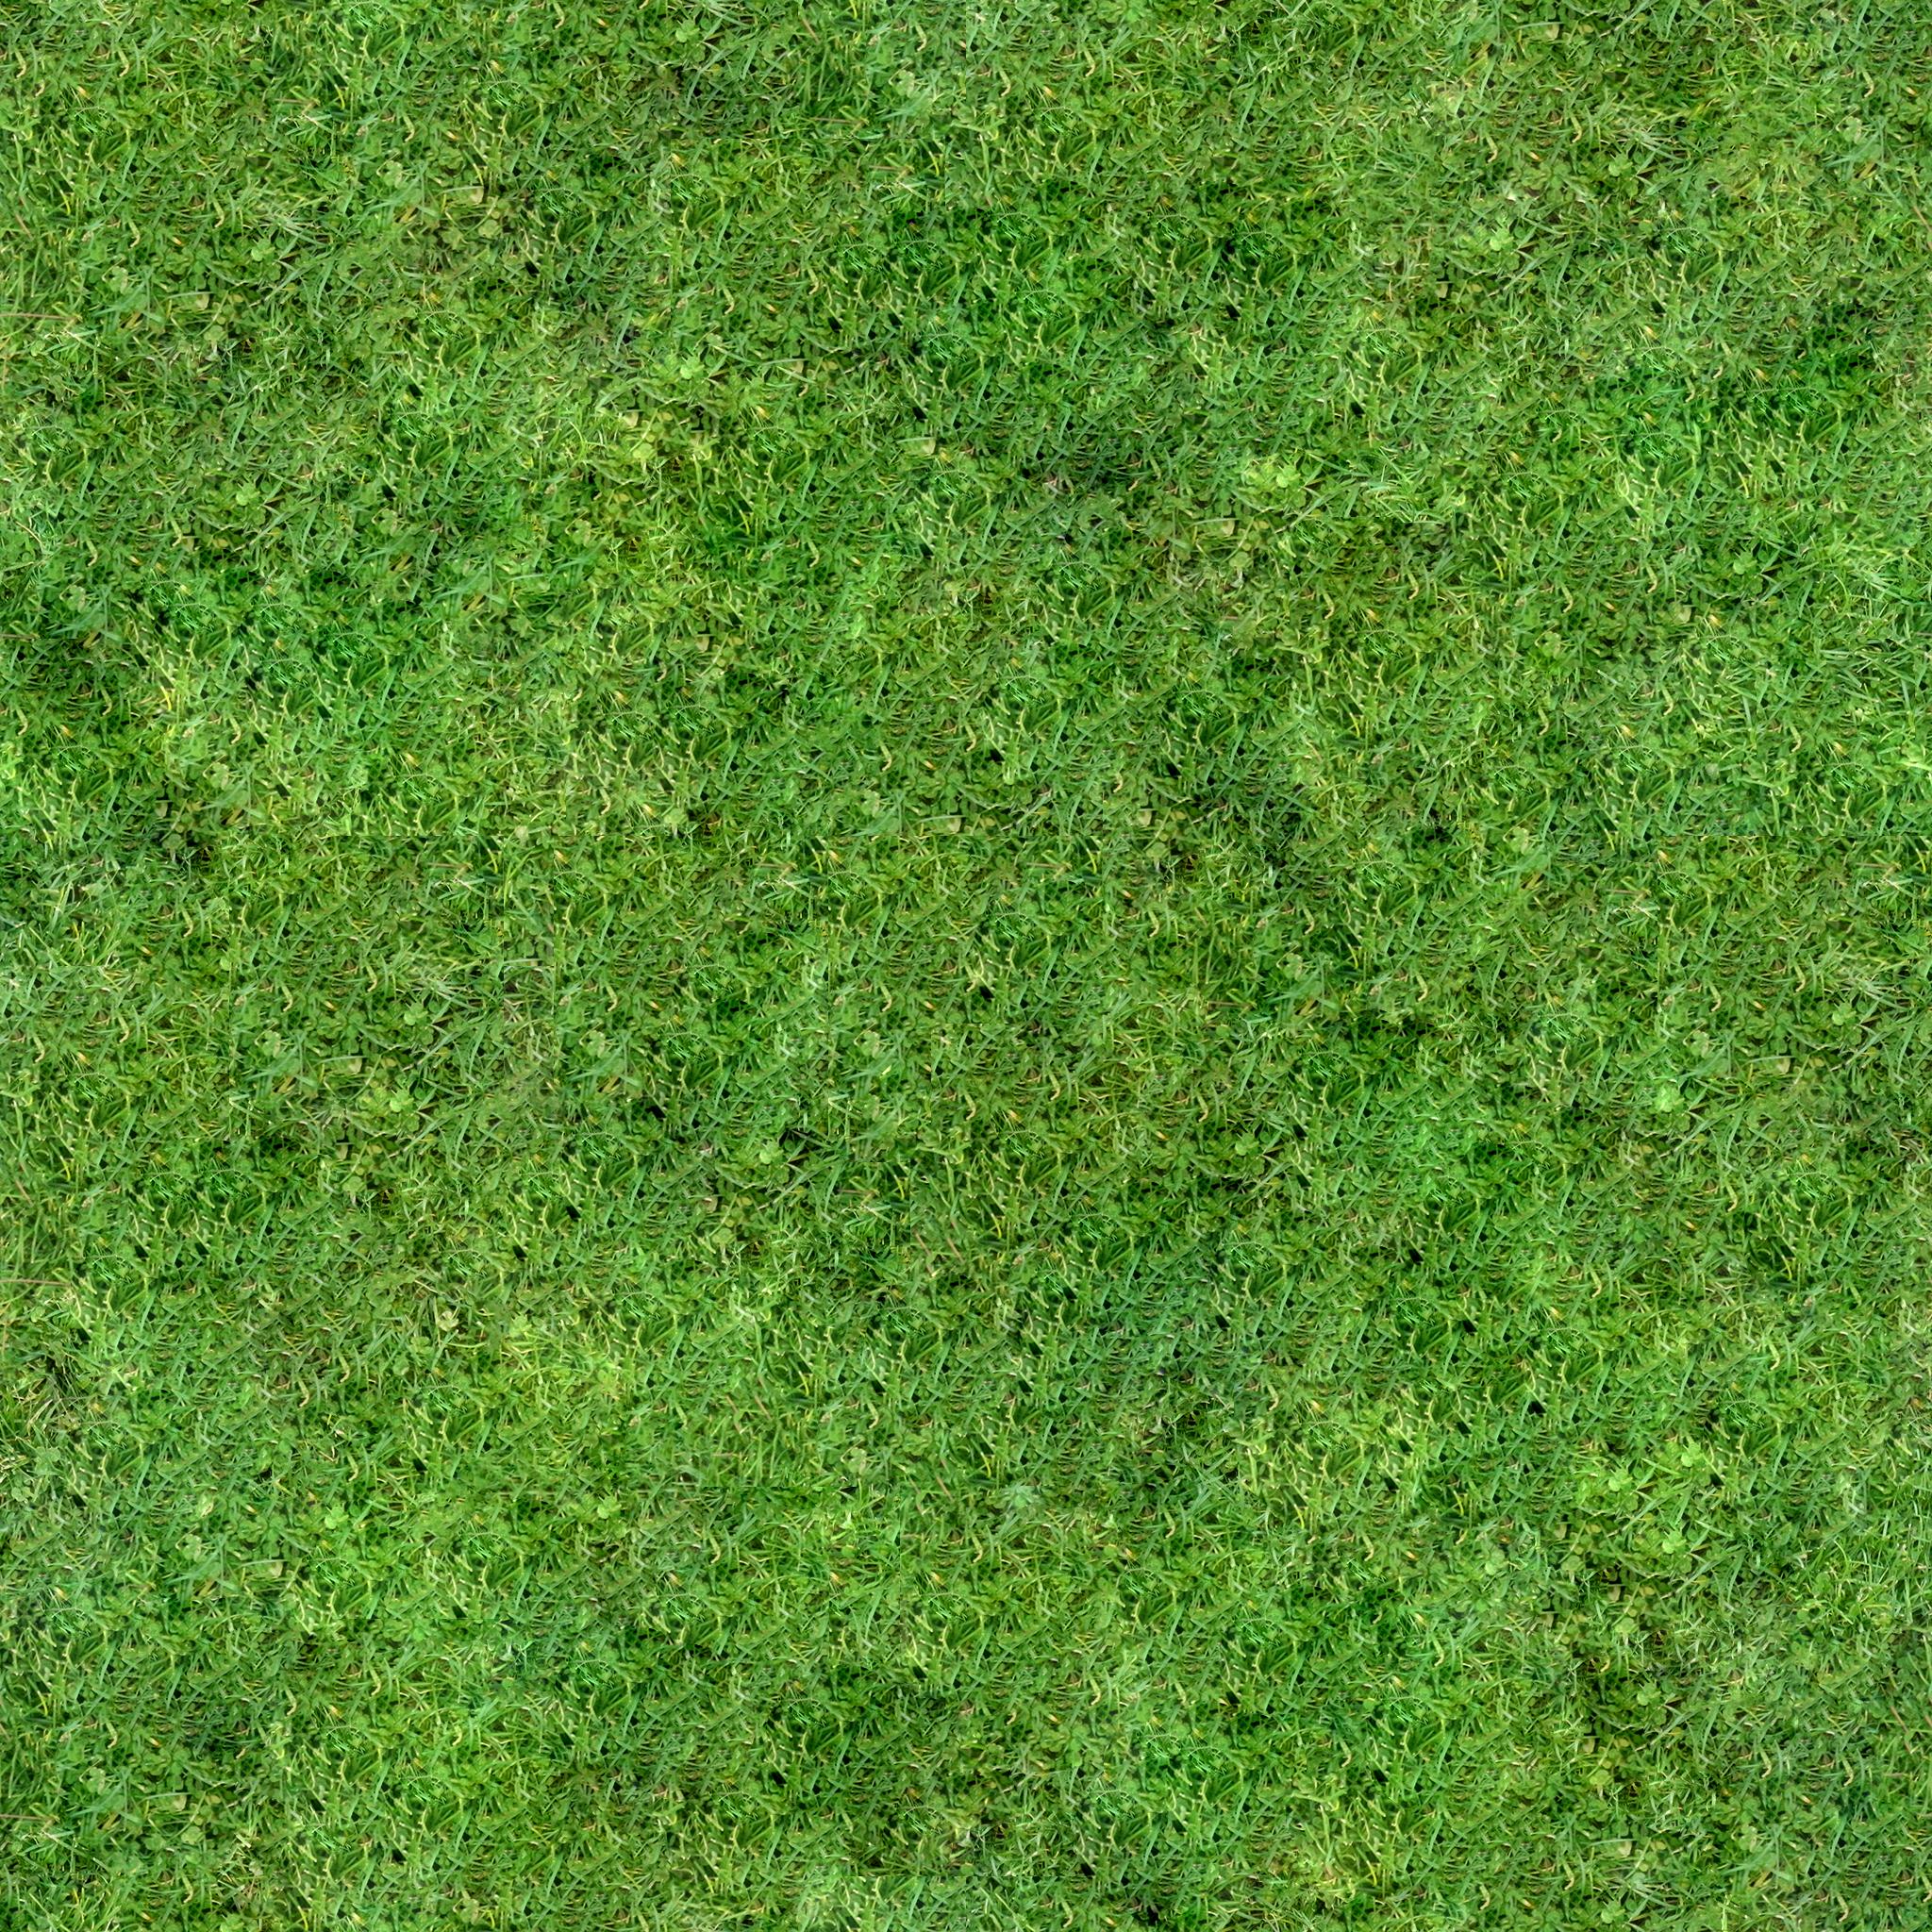 Grass_Green_01_v2.png